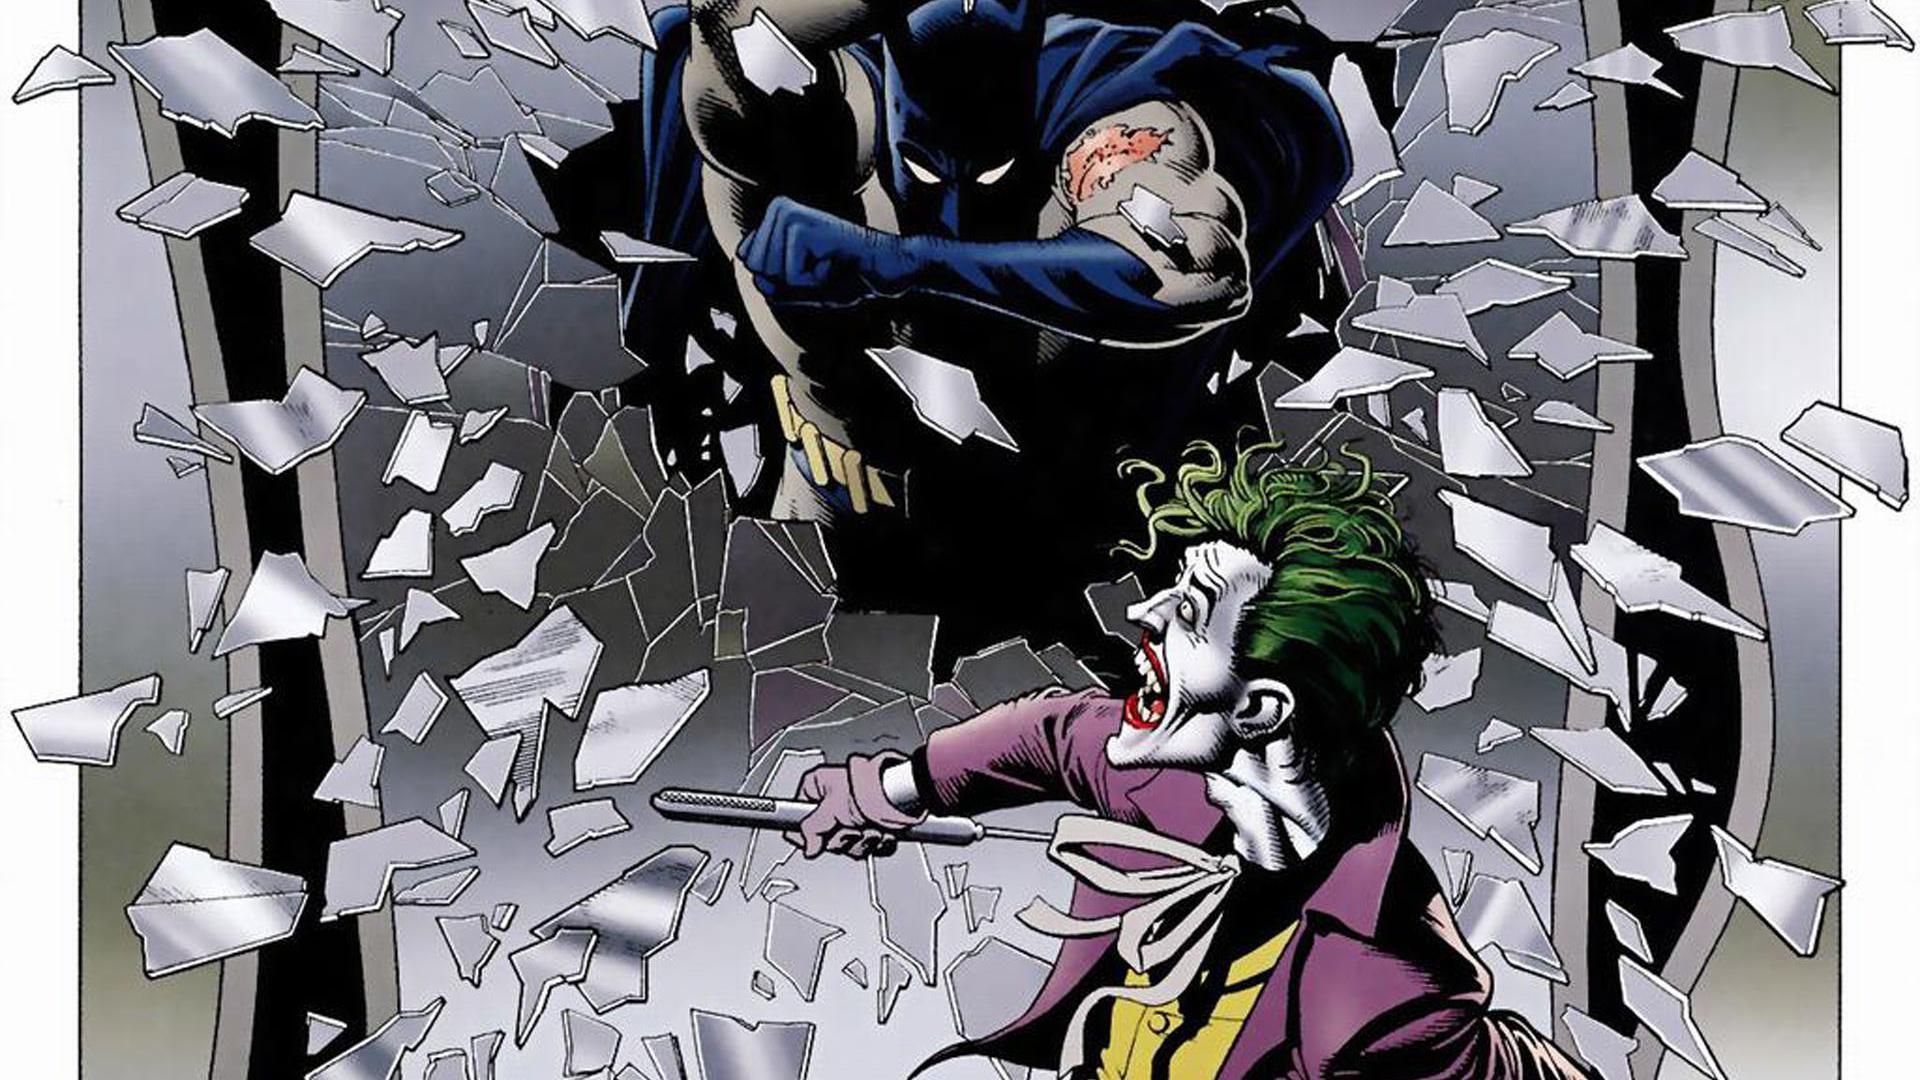 batman dc comics the joker killing joke HD Wallpaper   Funny Humour 1920x1080